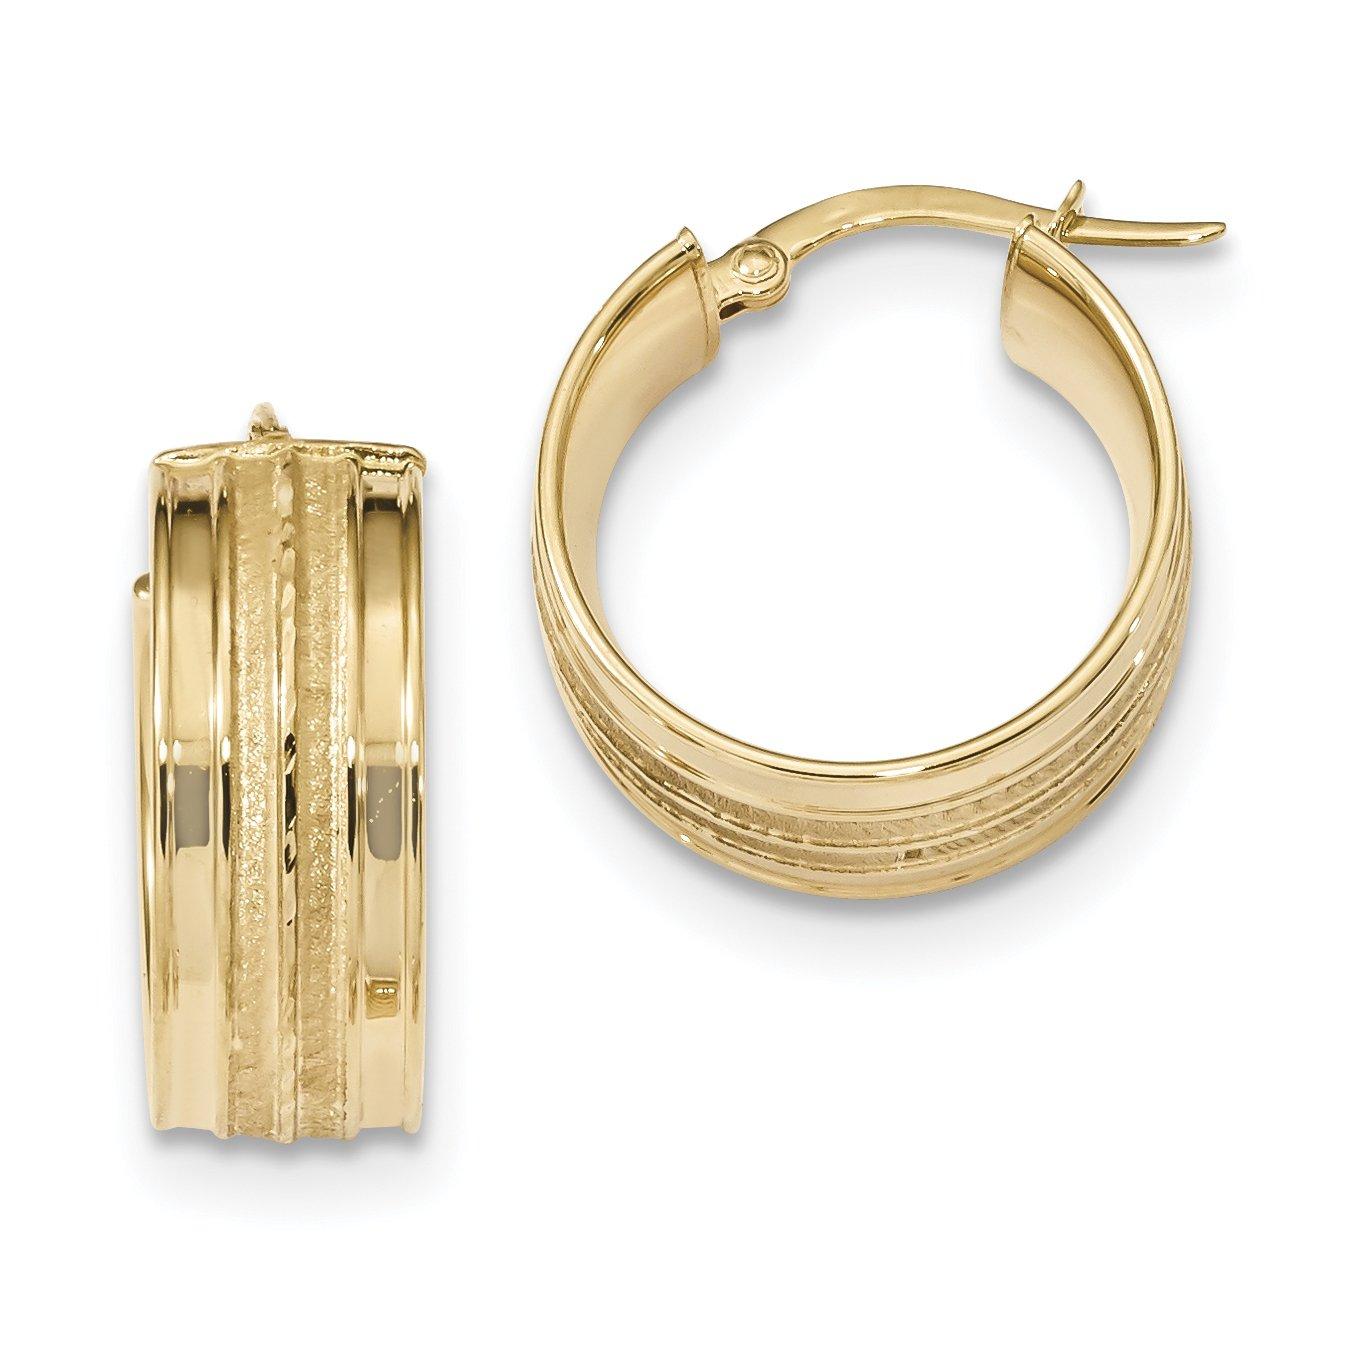 ICE CARATS 14k Yellow Gold Hoop Earrings Ear Hoops Set Fine Jewelry Gift Set For Women Heart by ICE CARATS (Image #1)